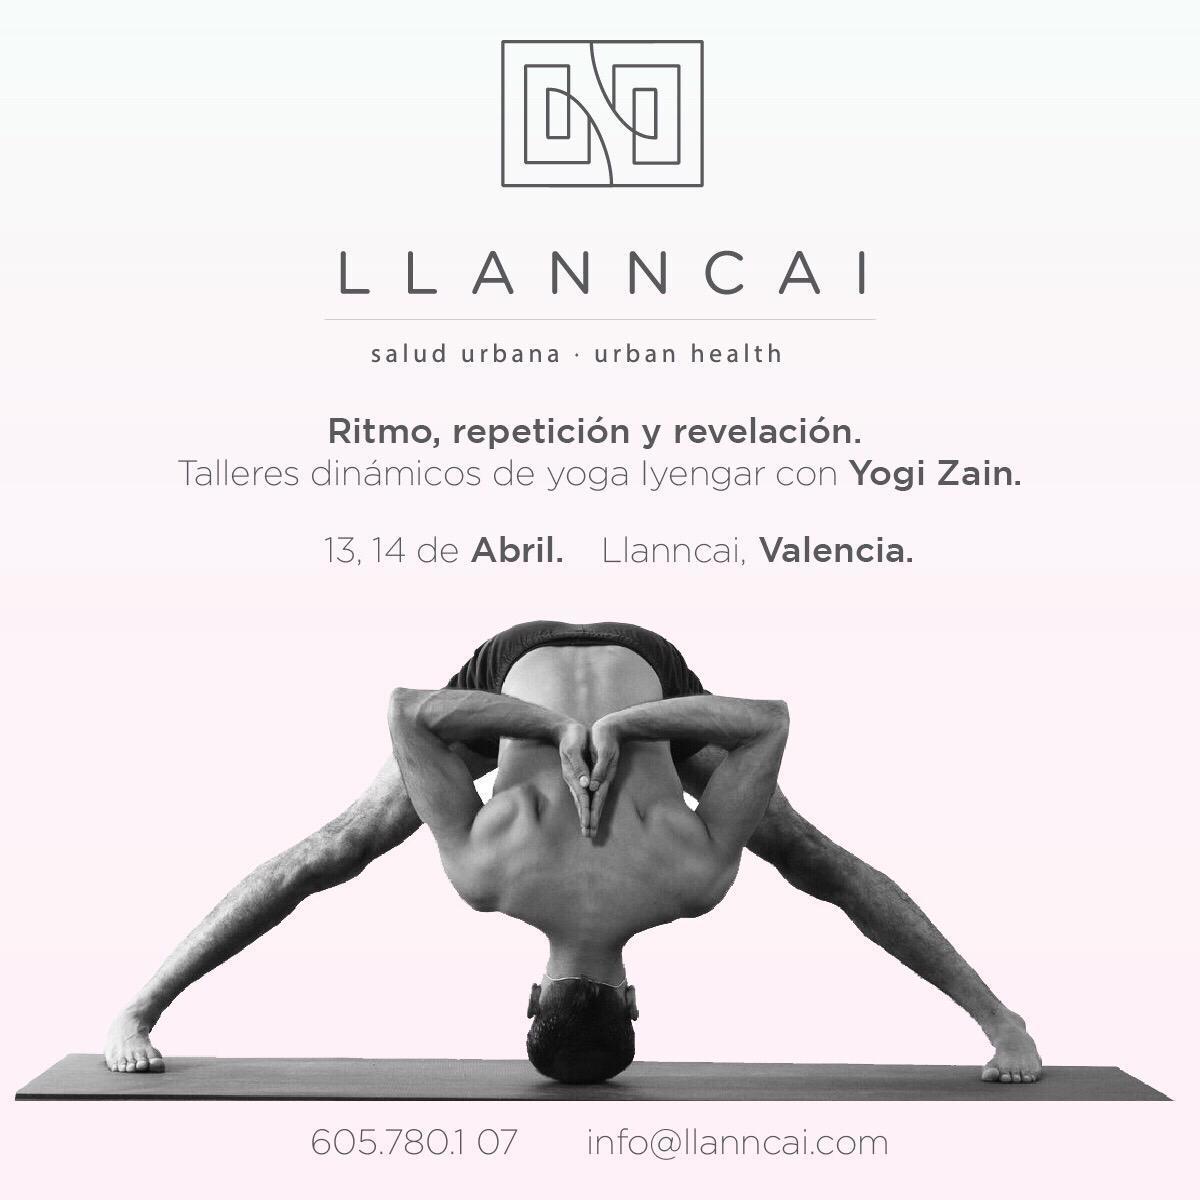 Yogi-Zain-Valencia-Spain.jpg